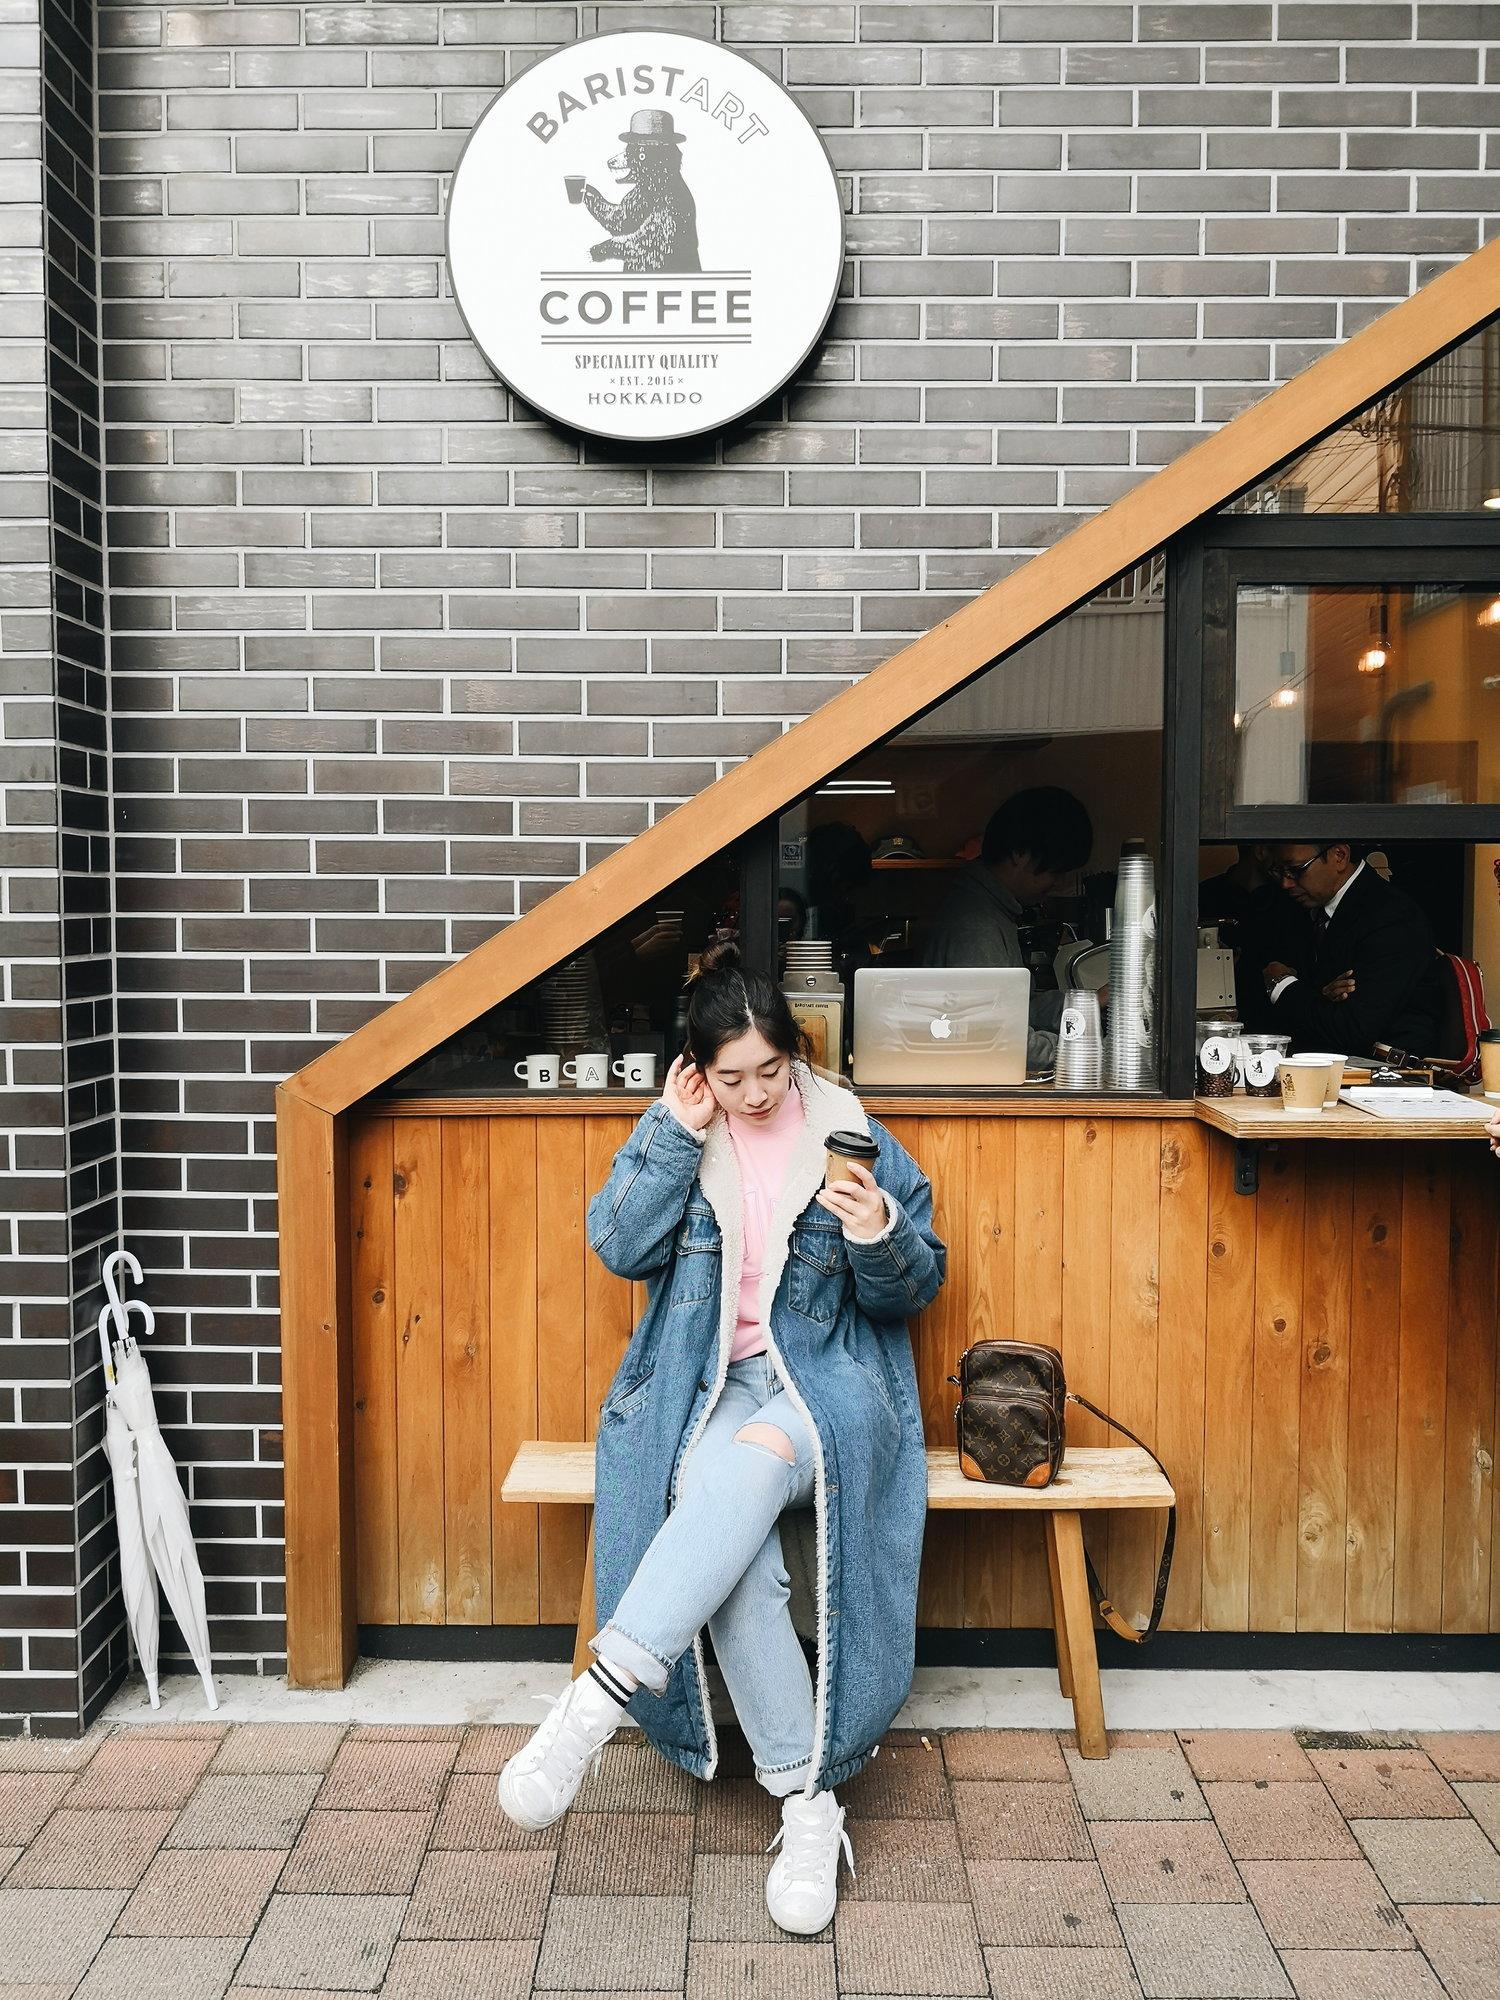 baristart-coffee-sapporo-04.jpg